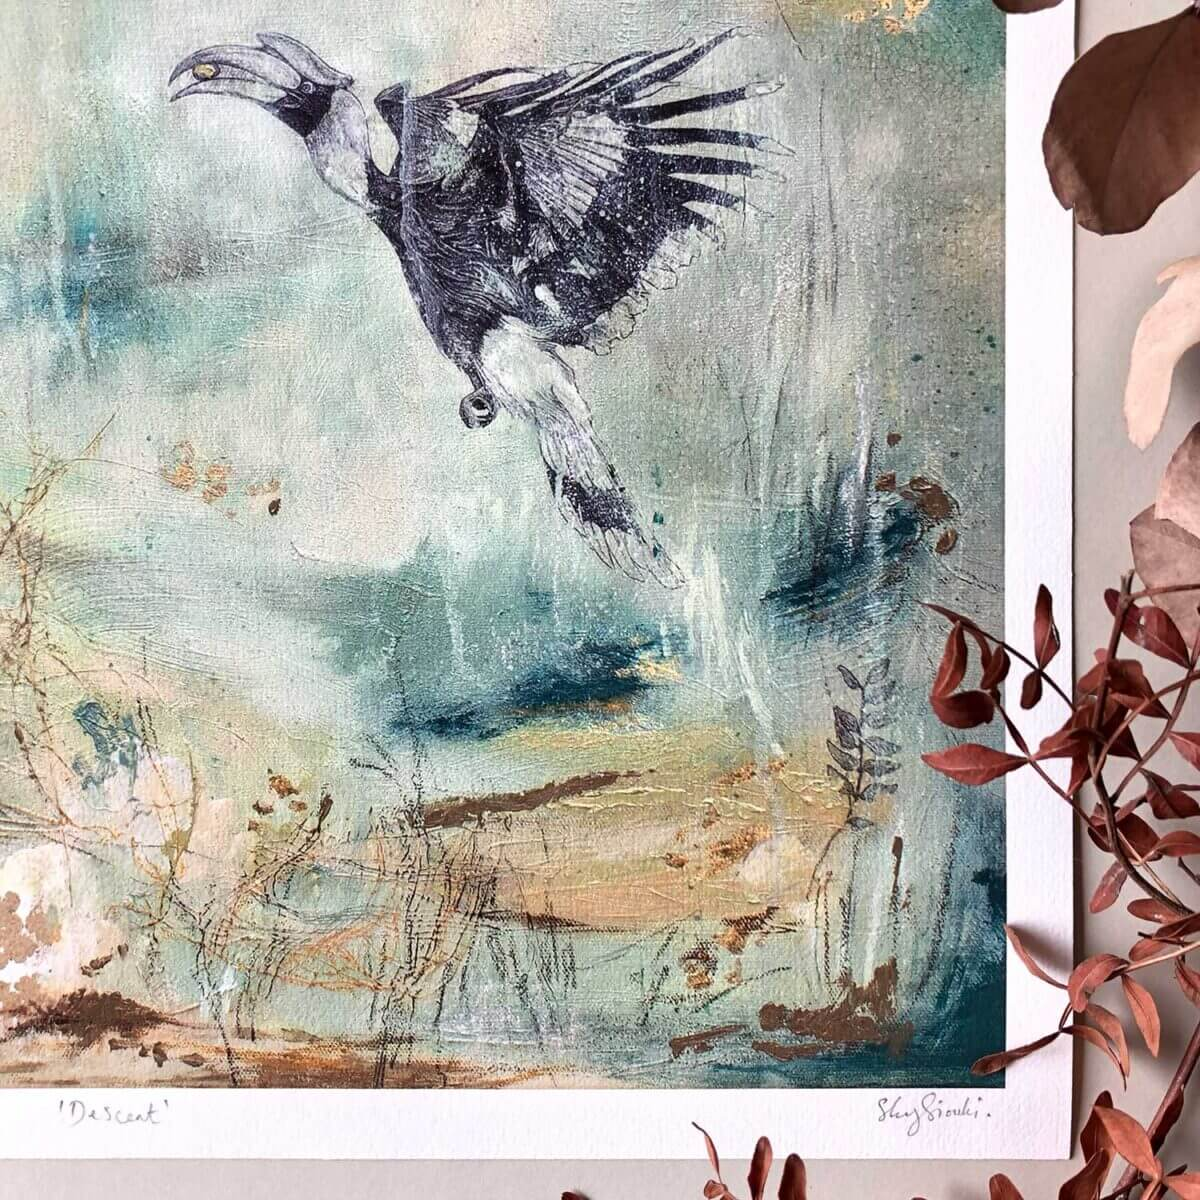 Descent-Print-Hornbill-Sky-Siouki